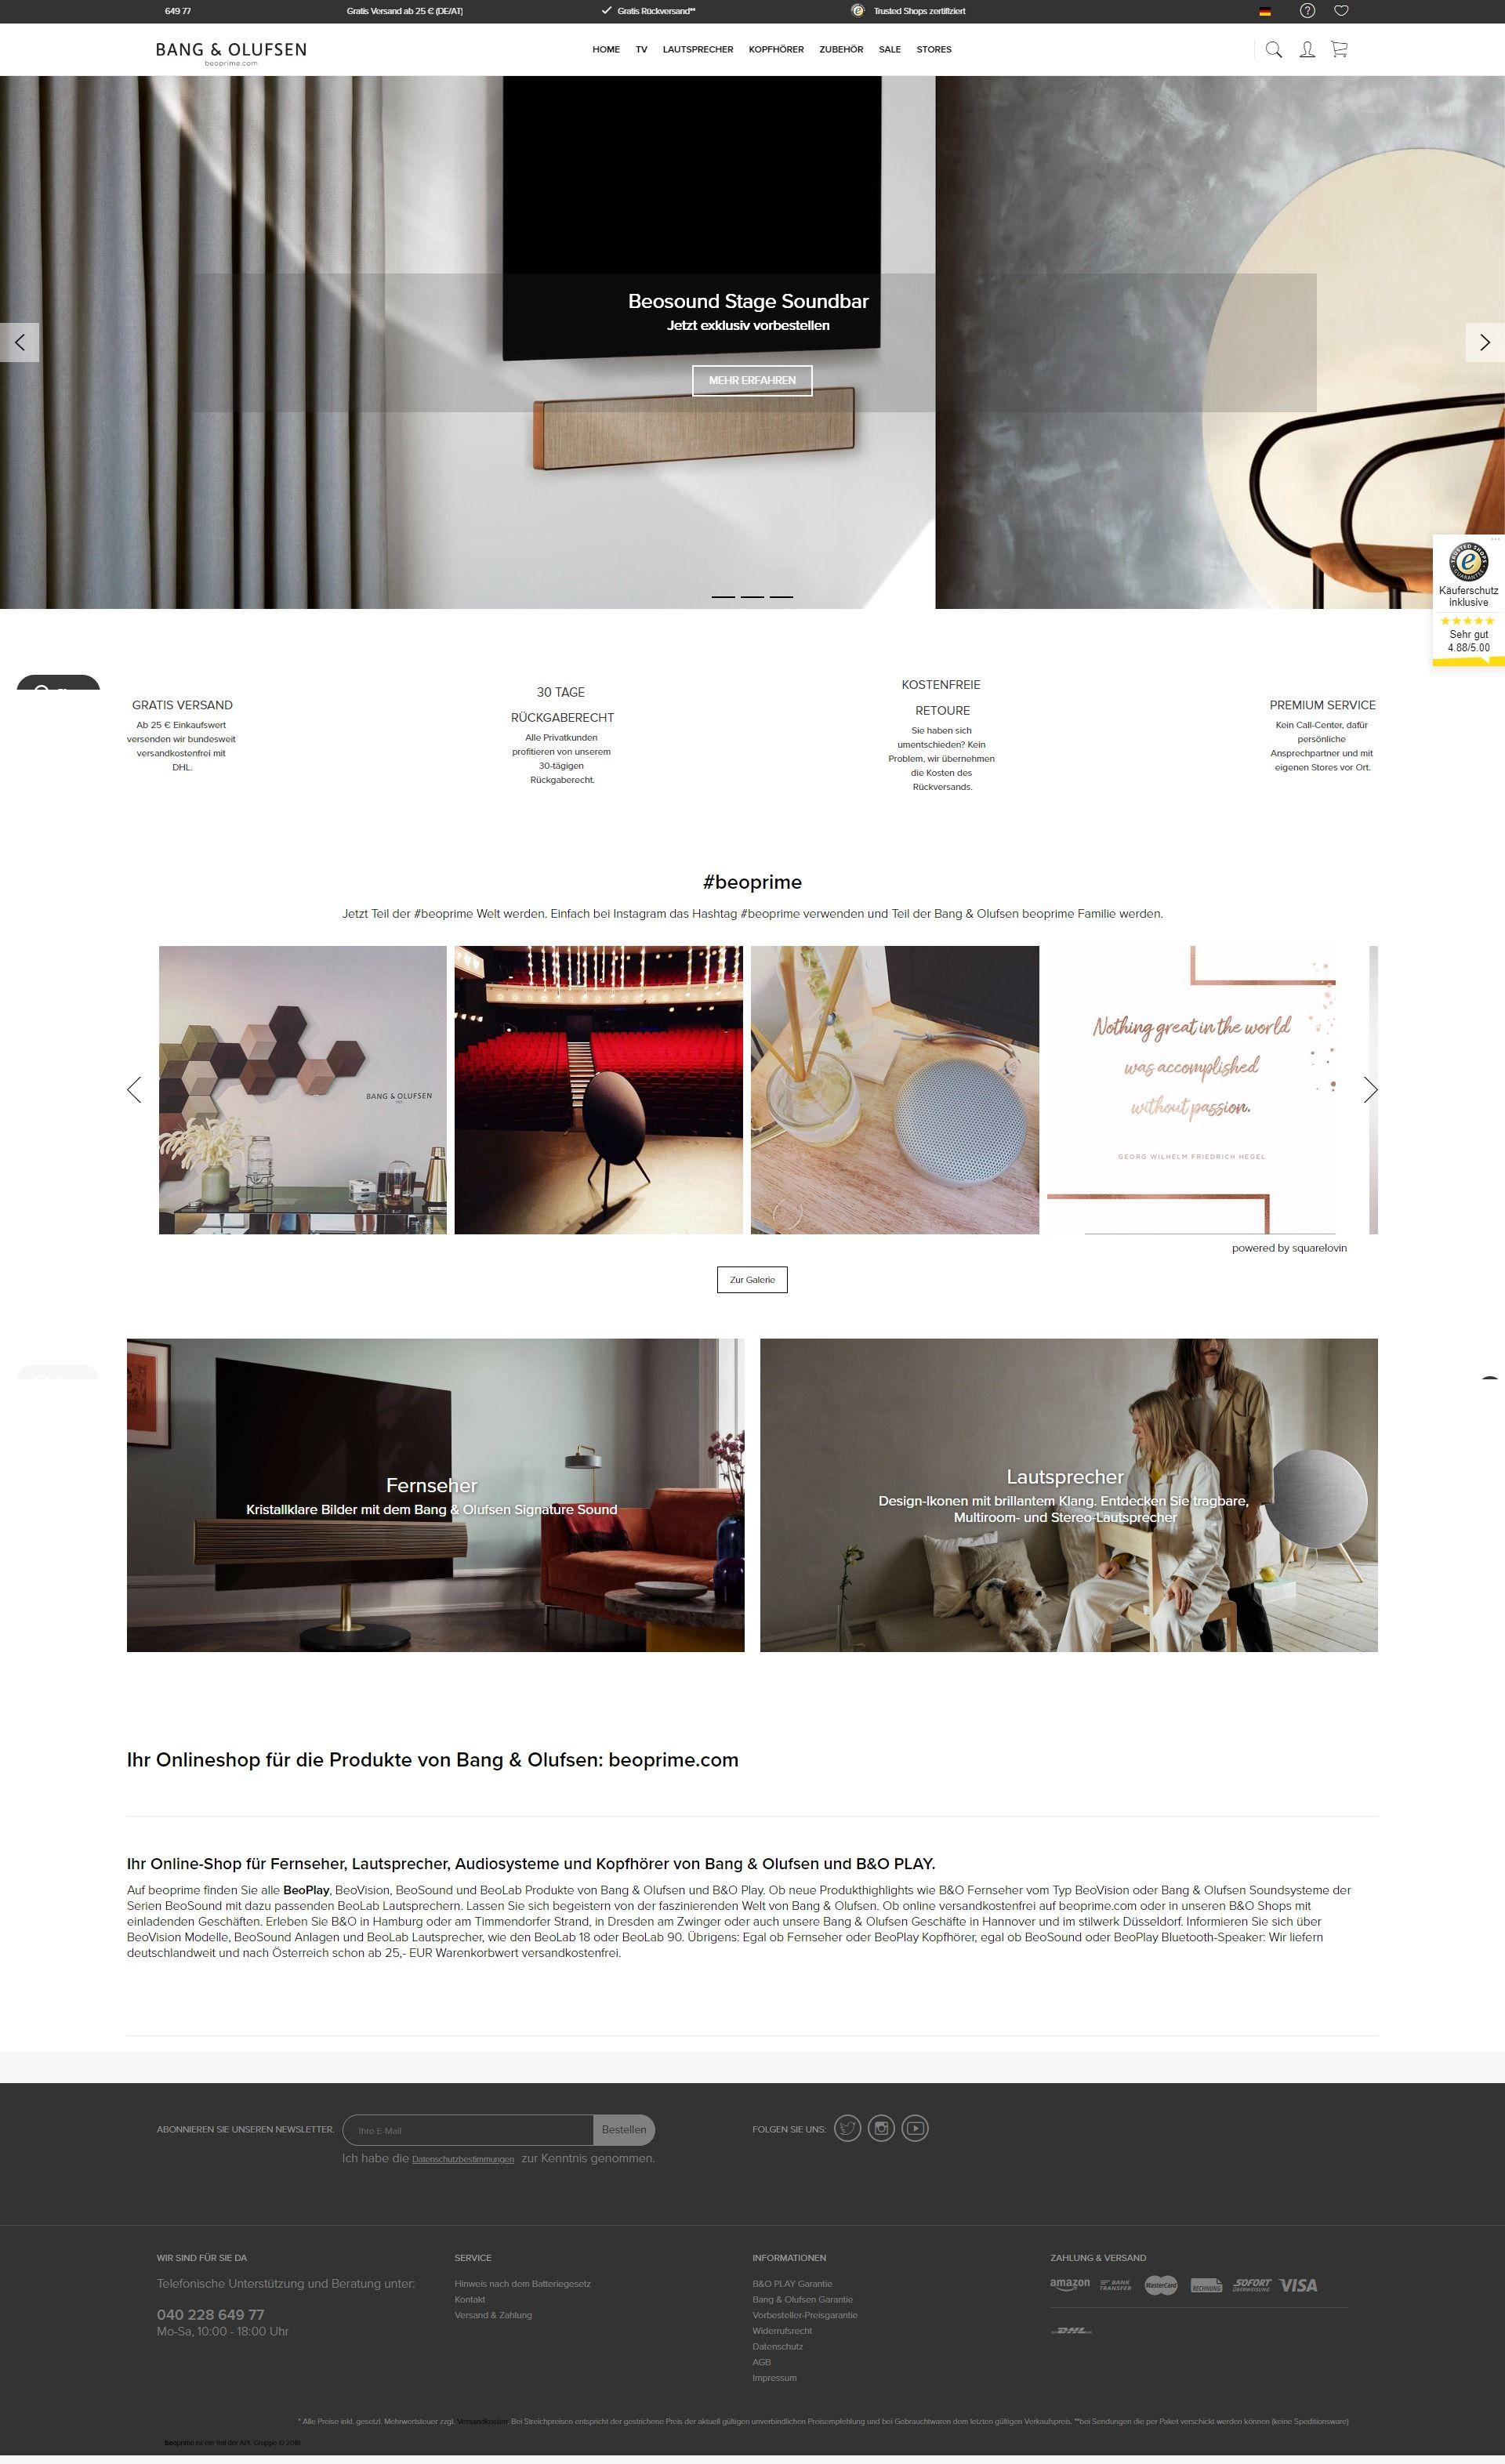 E Commerce Shopware Onlineshop Webdesign Templates Design Themes Tools Webshop Layout Template Inspiration Website Theme Simpl Online Shop Web Design Webdesign